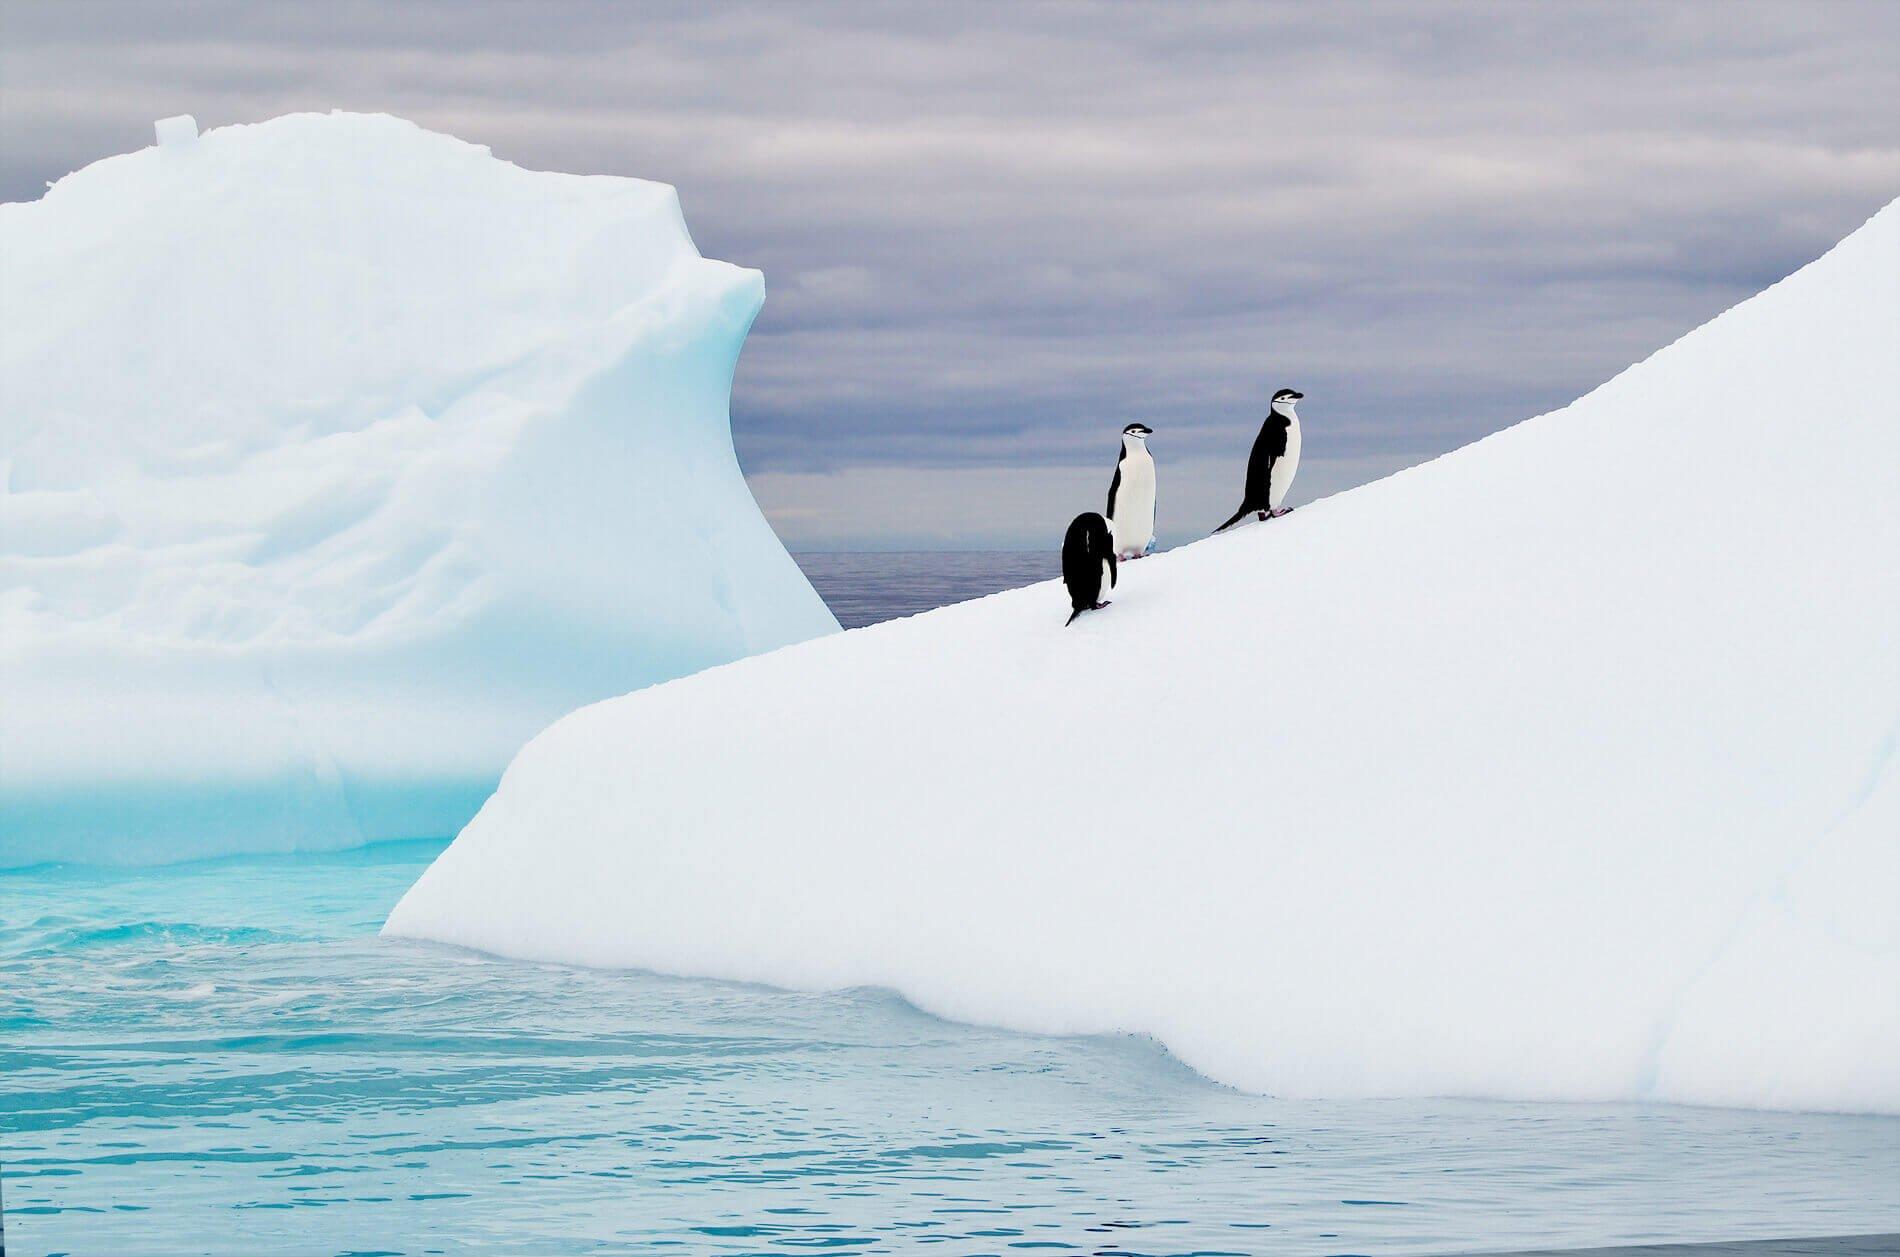 Mastro Patagonico – Slide Home promo Antartide